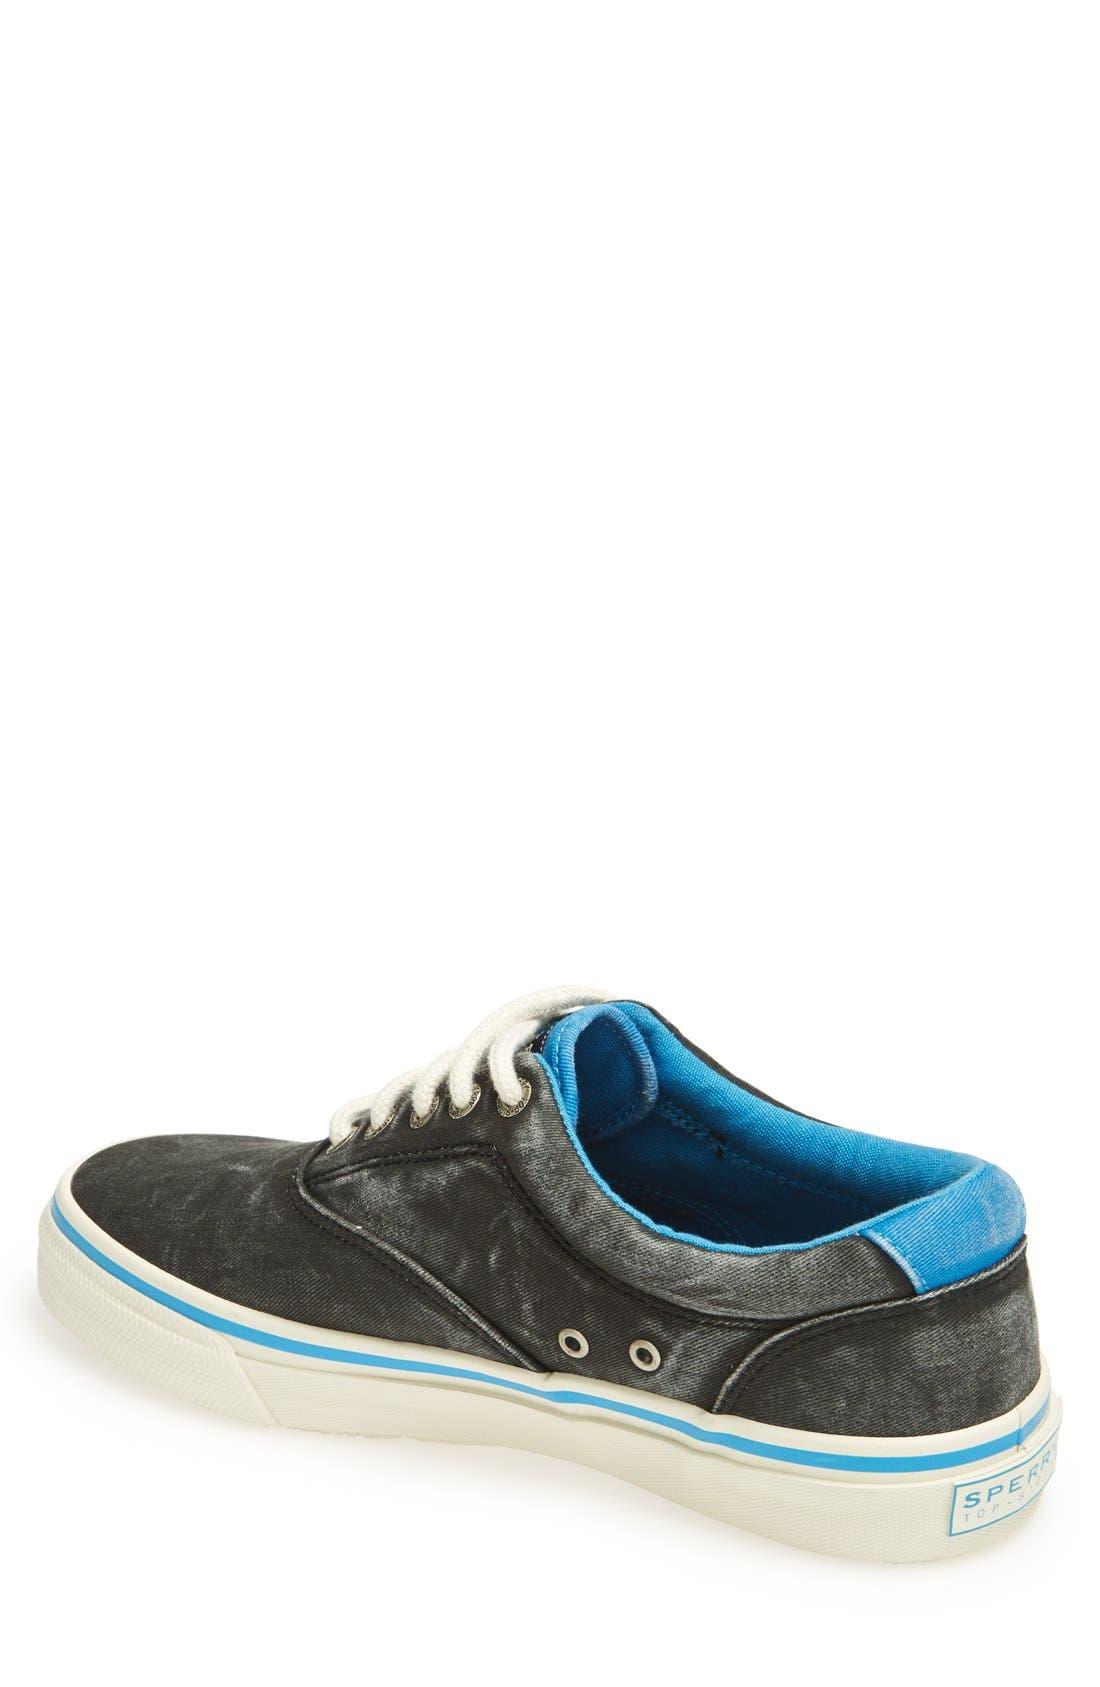 Alternate Image 2  - Sperry Top-Sider® 'Striper CVO' Sneaker (Men)